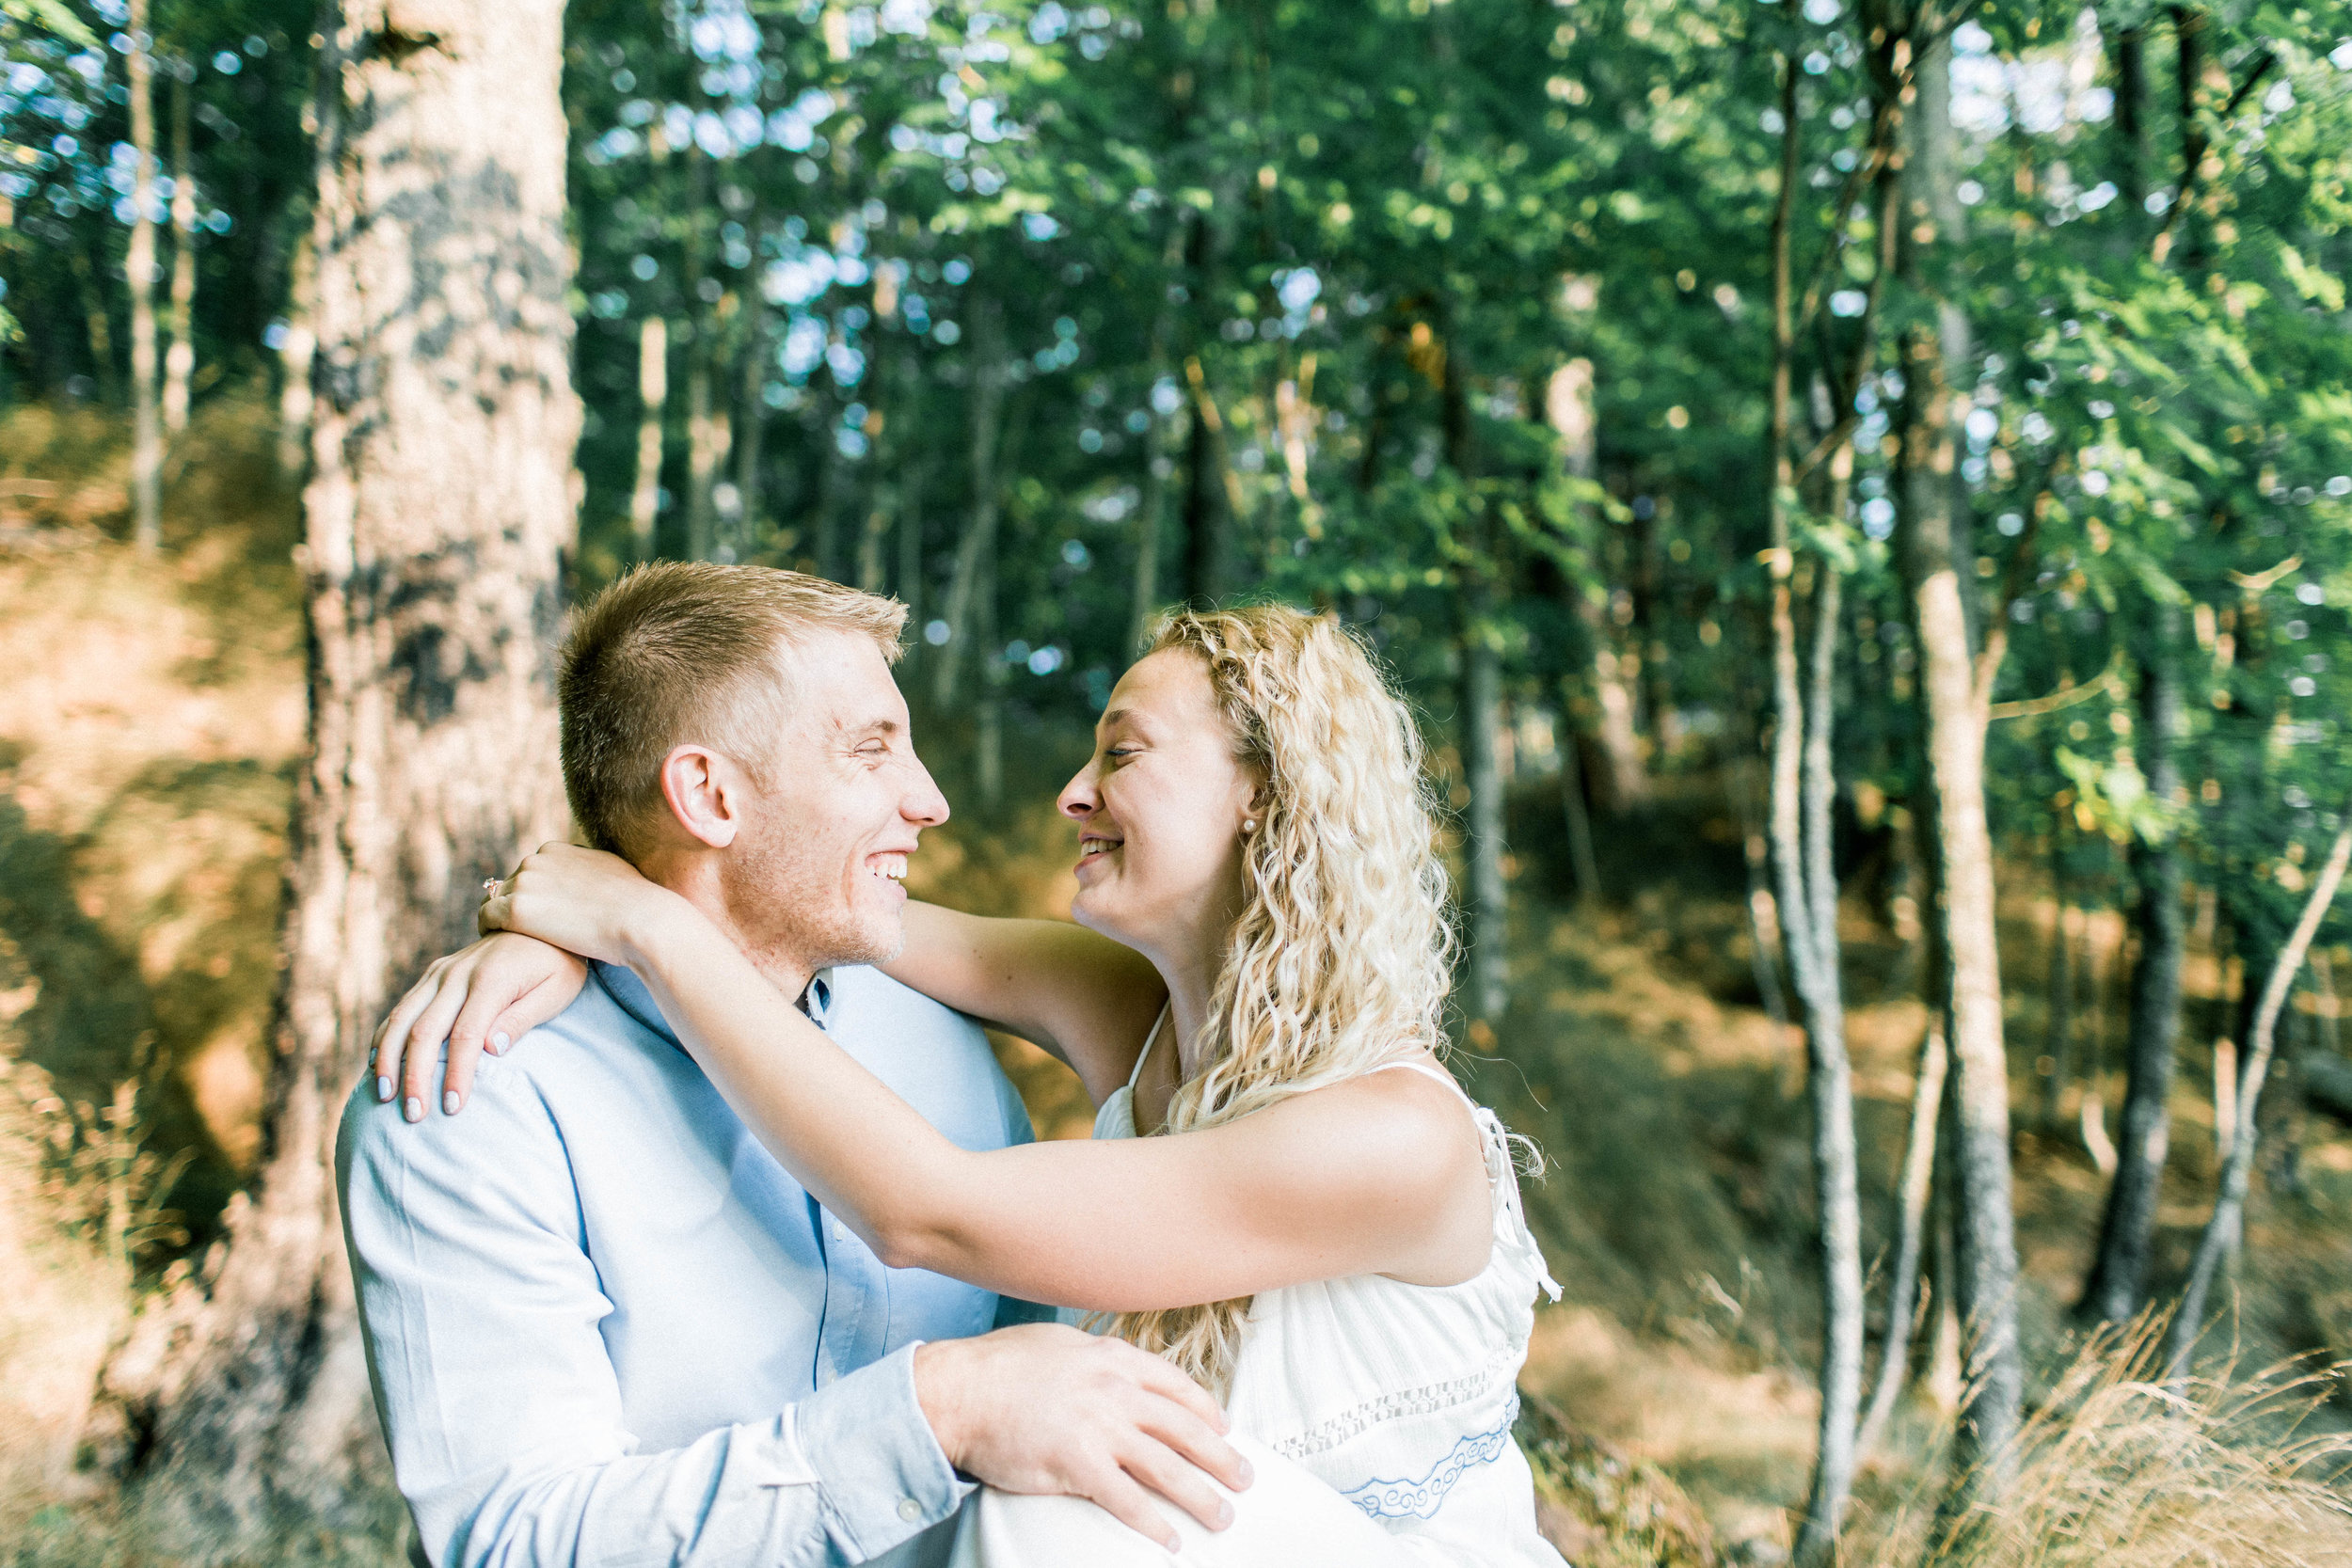 Northern Michigan Engagement Photographer - Lauren and Brent 021.jpg